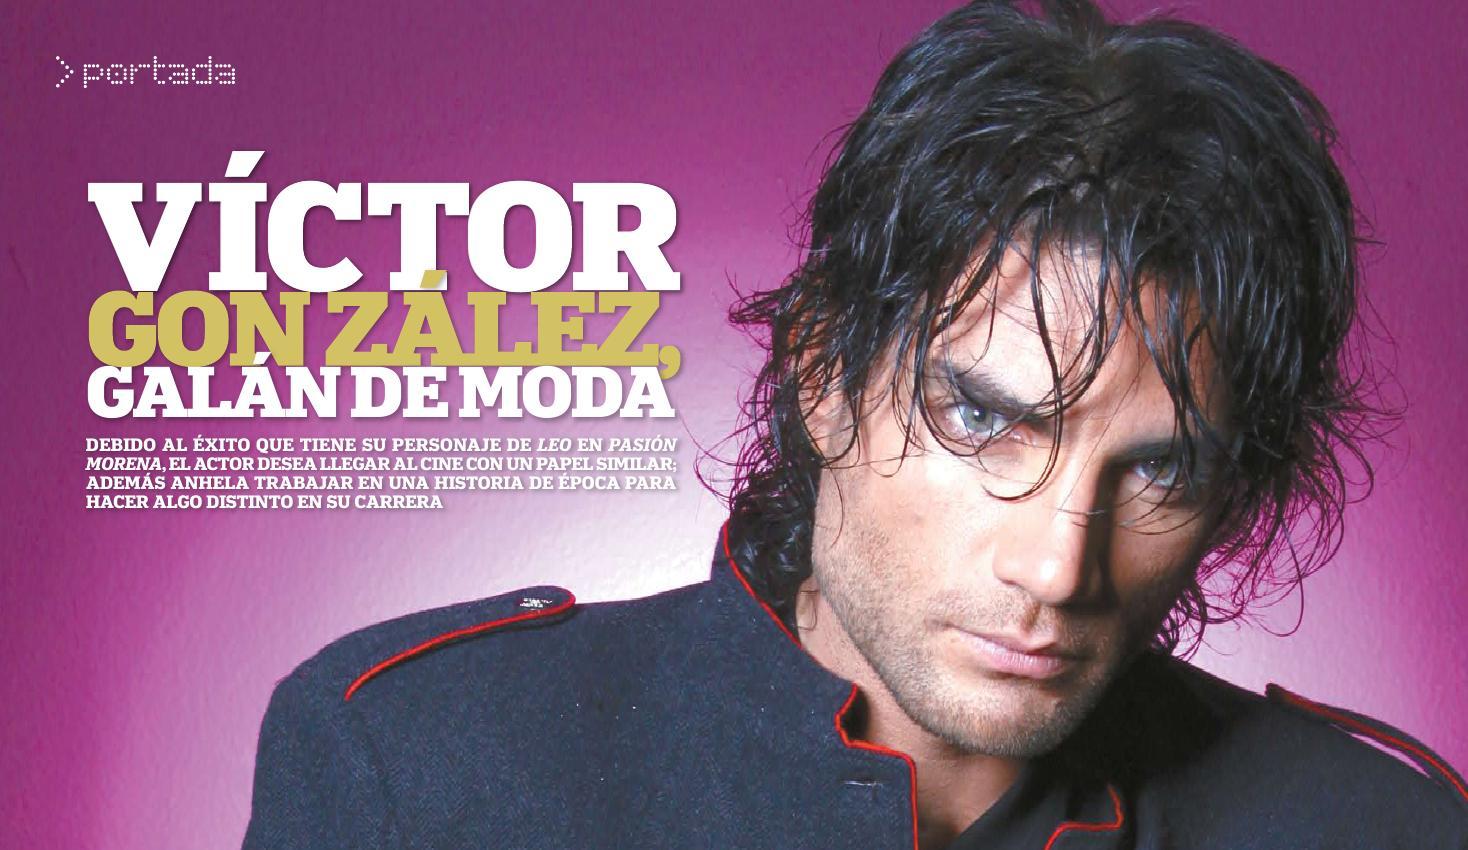 Виктор Гонсалес / Victor Gonzalez 2cafeb1b5870